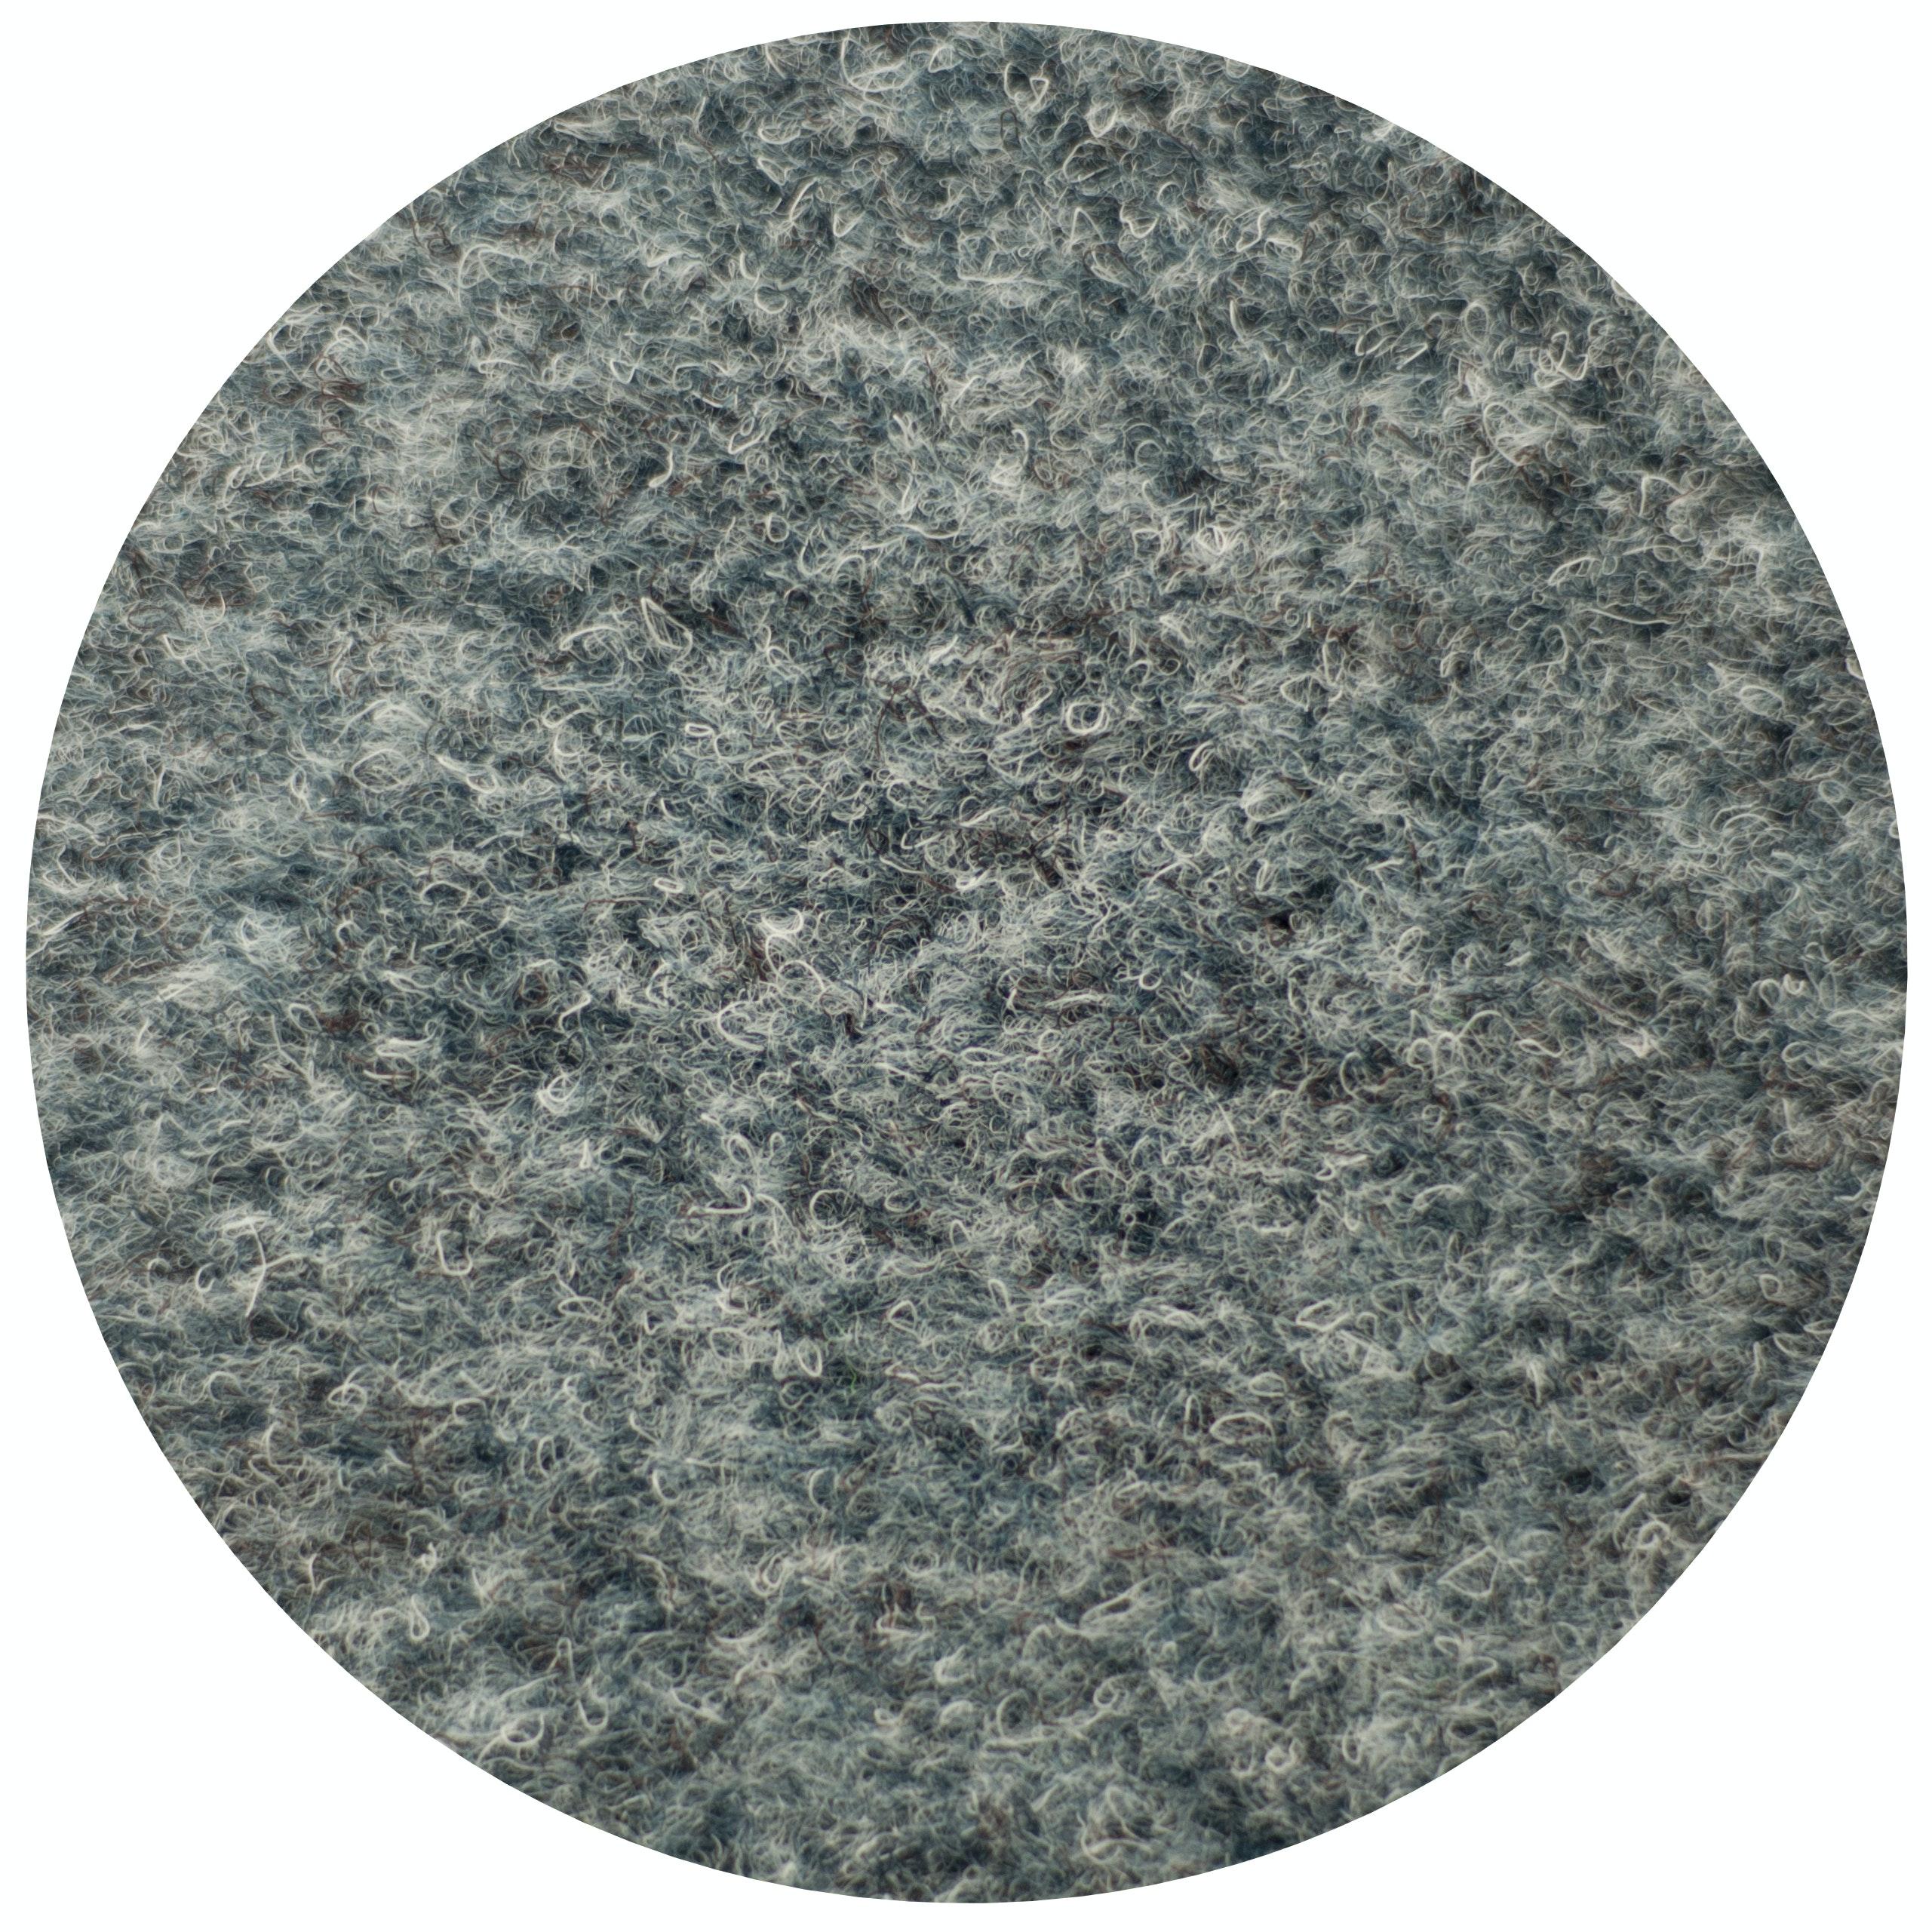 Konstgräs Grå / Blå slät B = 200 cm